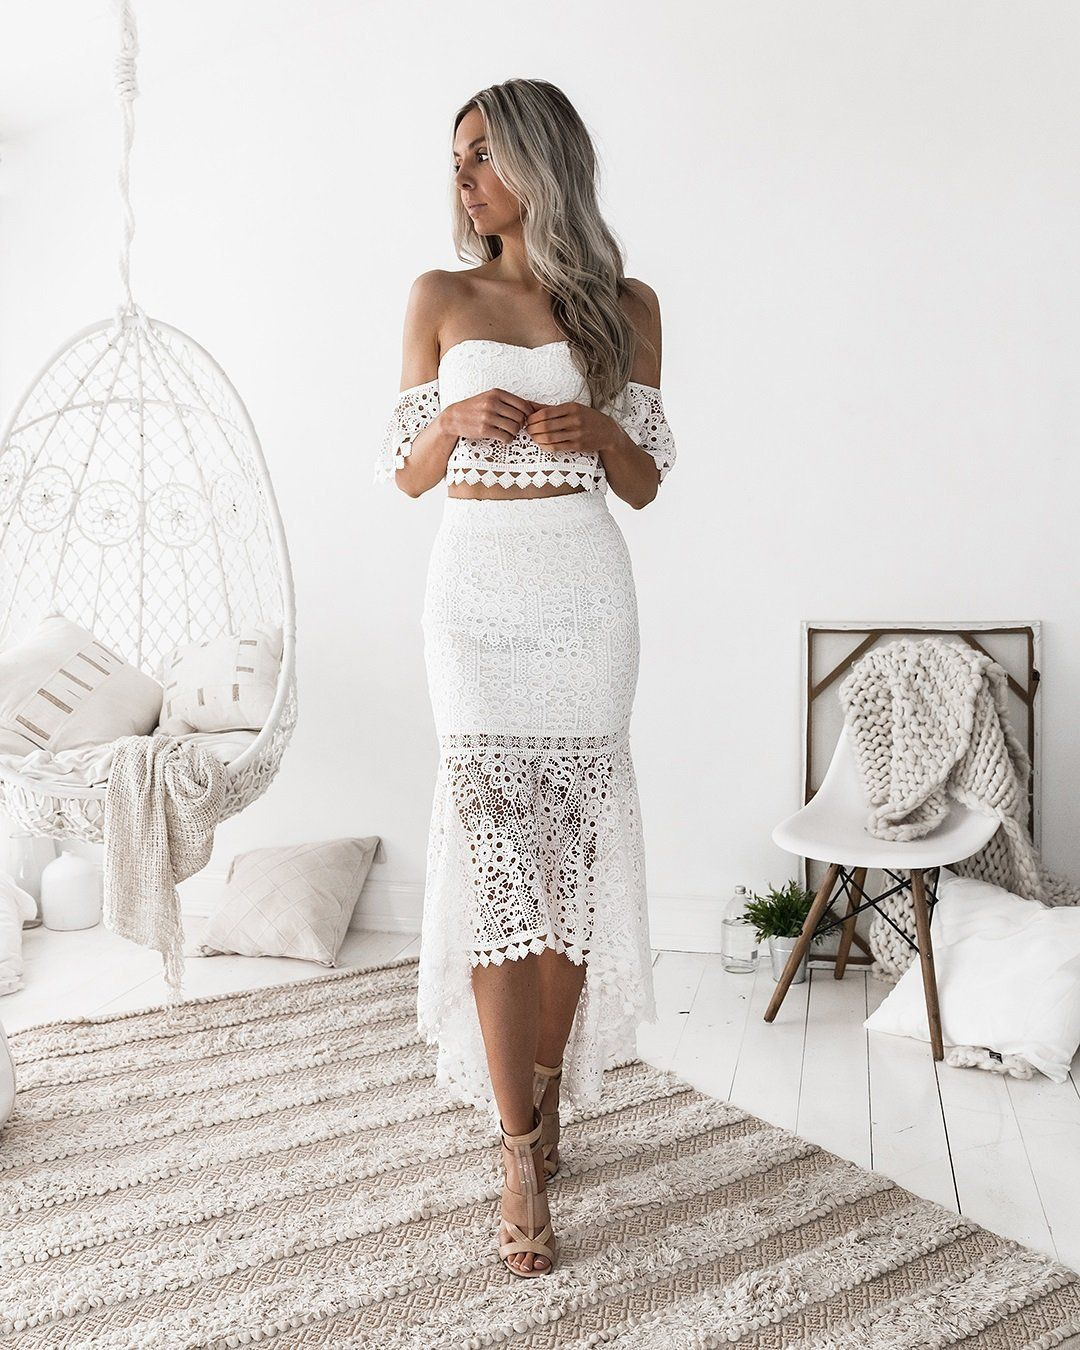 Celine Set White Lace Dress Piece Dress Two Piece Dress [ 1350 x 1080 Pixel ]